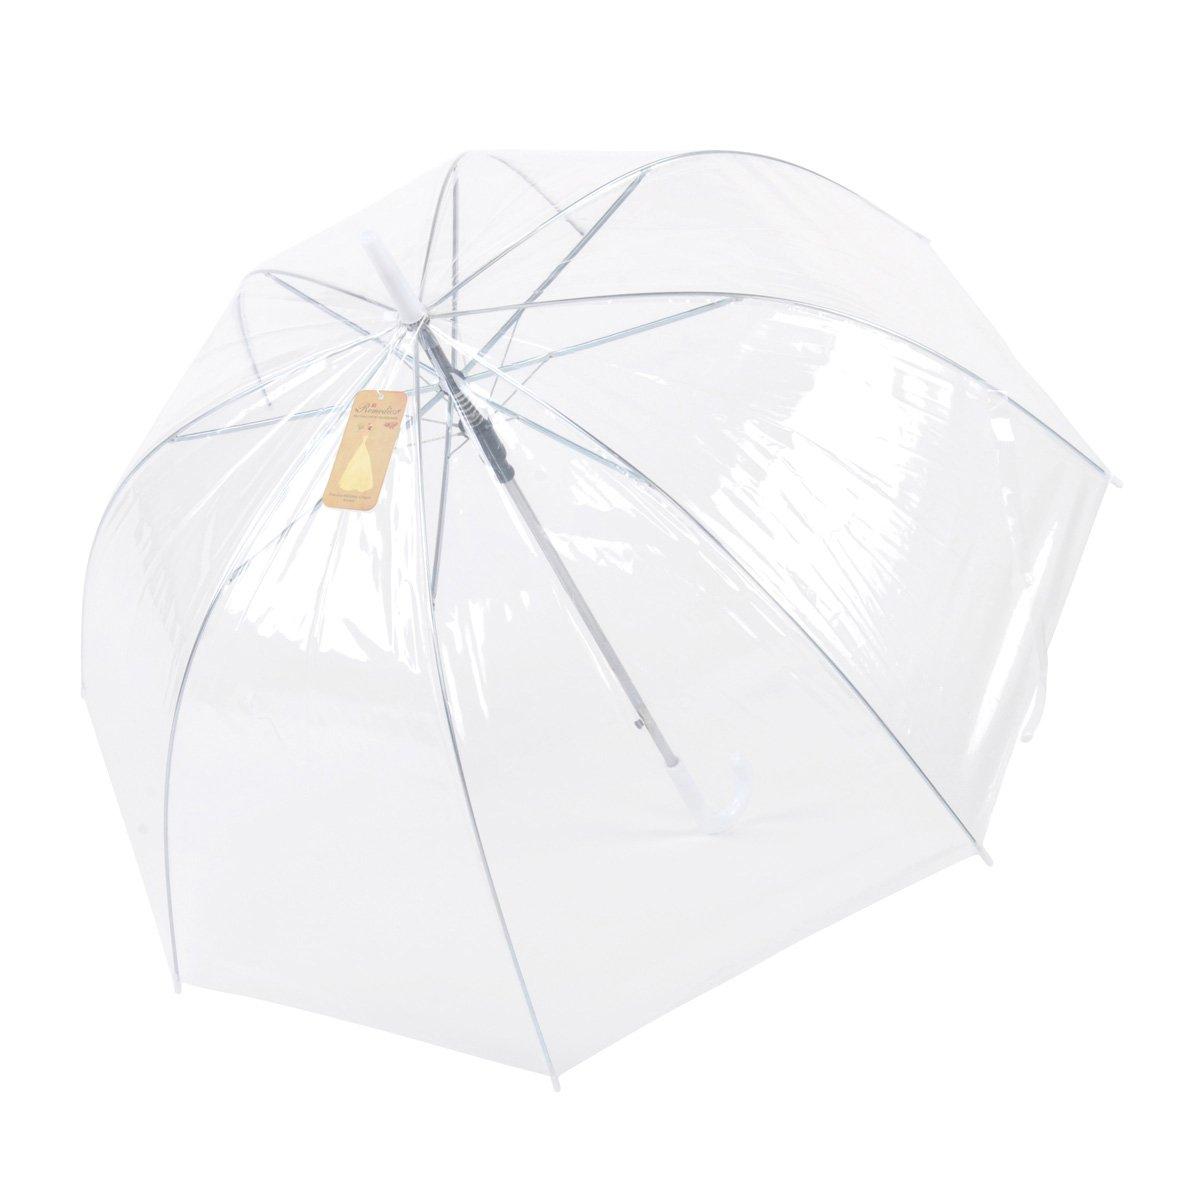 Remedios transparente burbuja transparente cúpula de apertura automática lluvia paraguas decoración Topwedding VC0S2_PPWLGYS130001